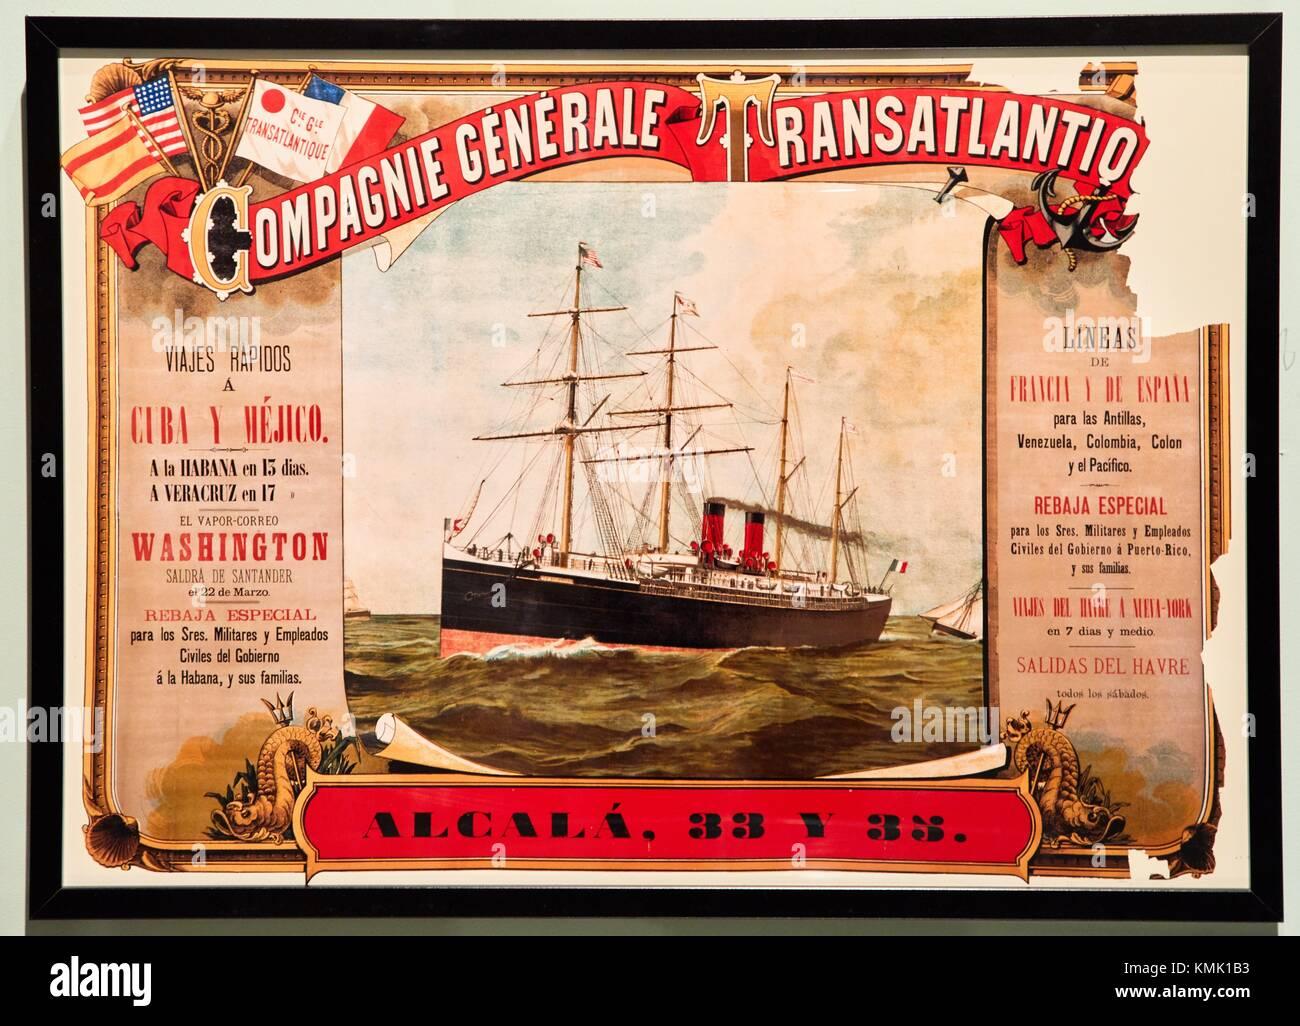 Transatlantique Stock Photos & Transatlantique Stock Images